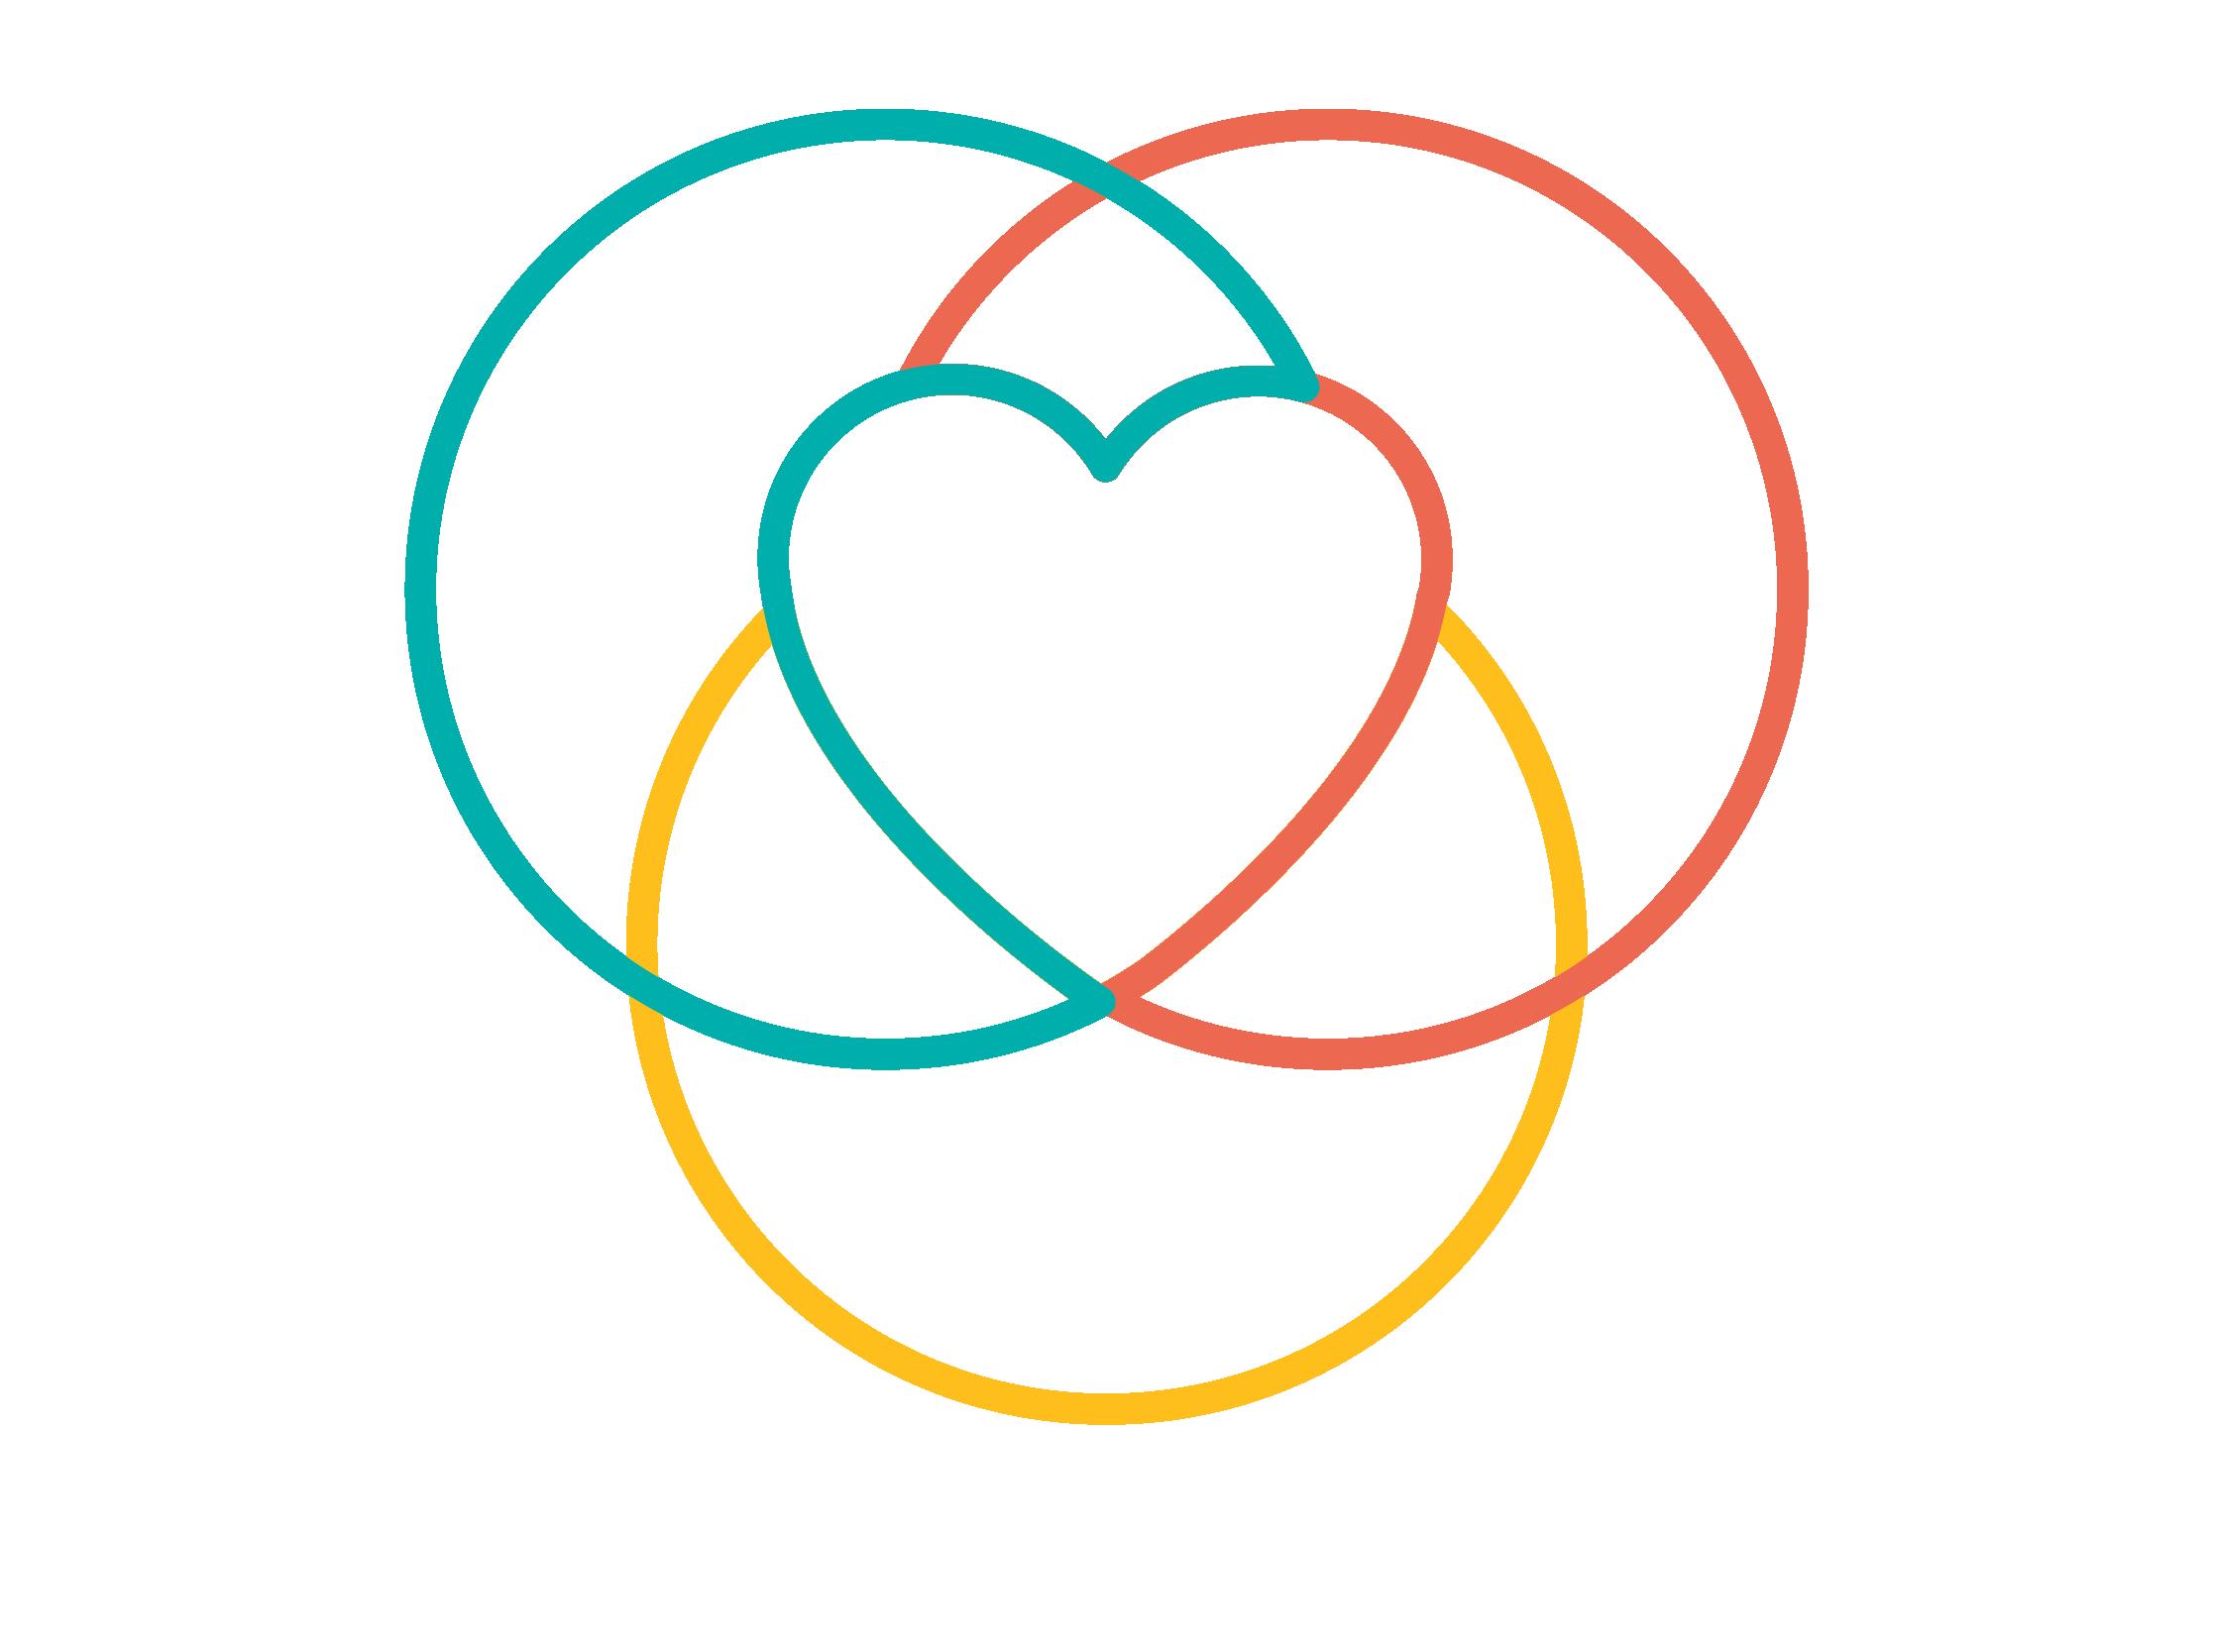 Pursuing-Peace-04-icon-color